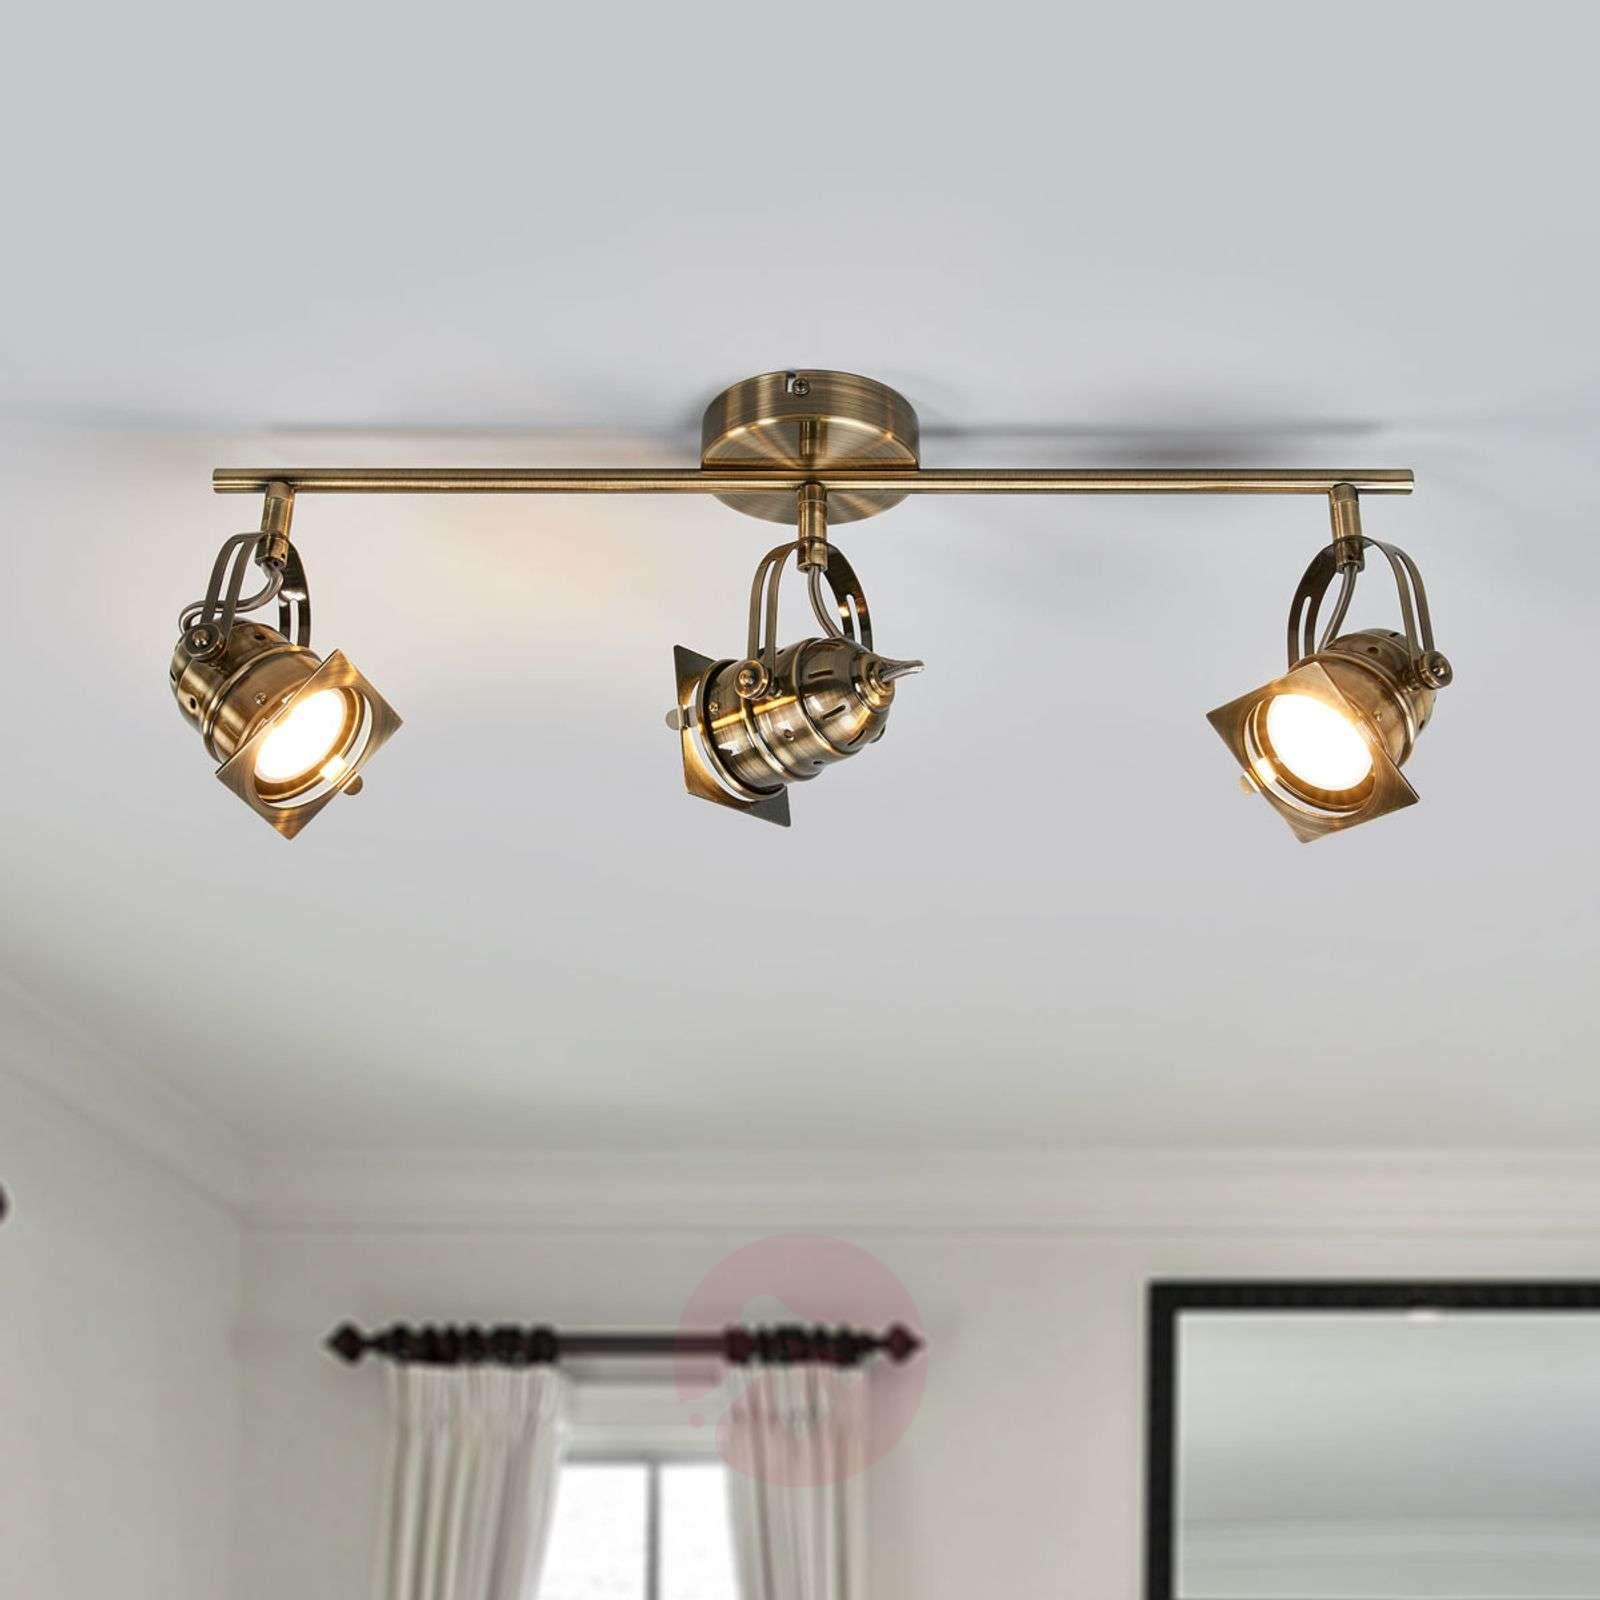 Janek Three Bulb Led Gu10 Ceiling Light 9639079 01